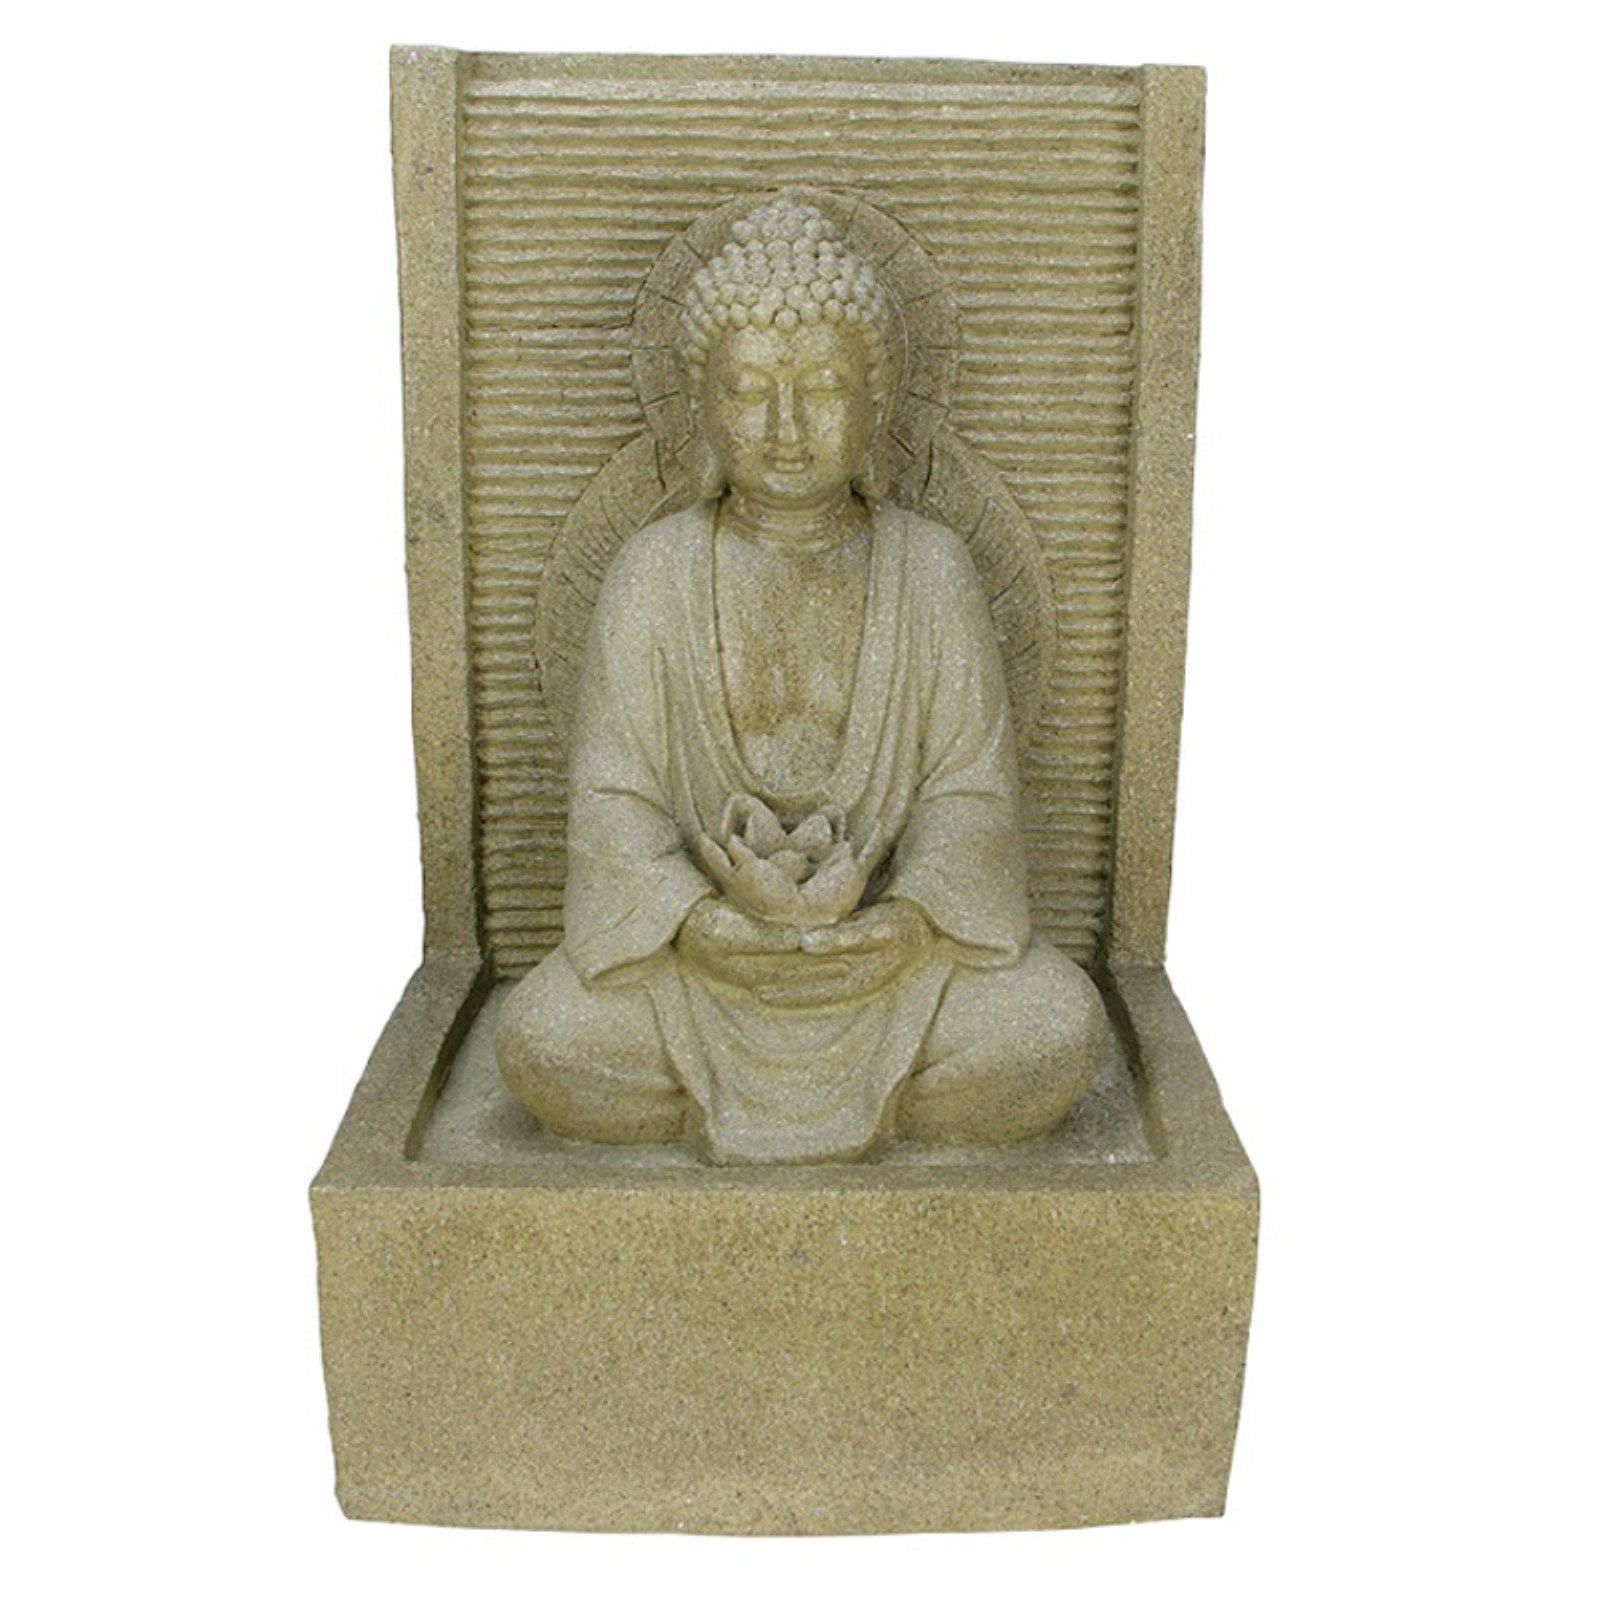 Northlight Praying Buddha Water Fountain Outdoor Statue